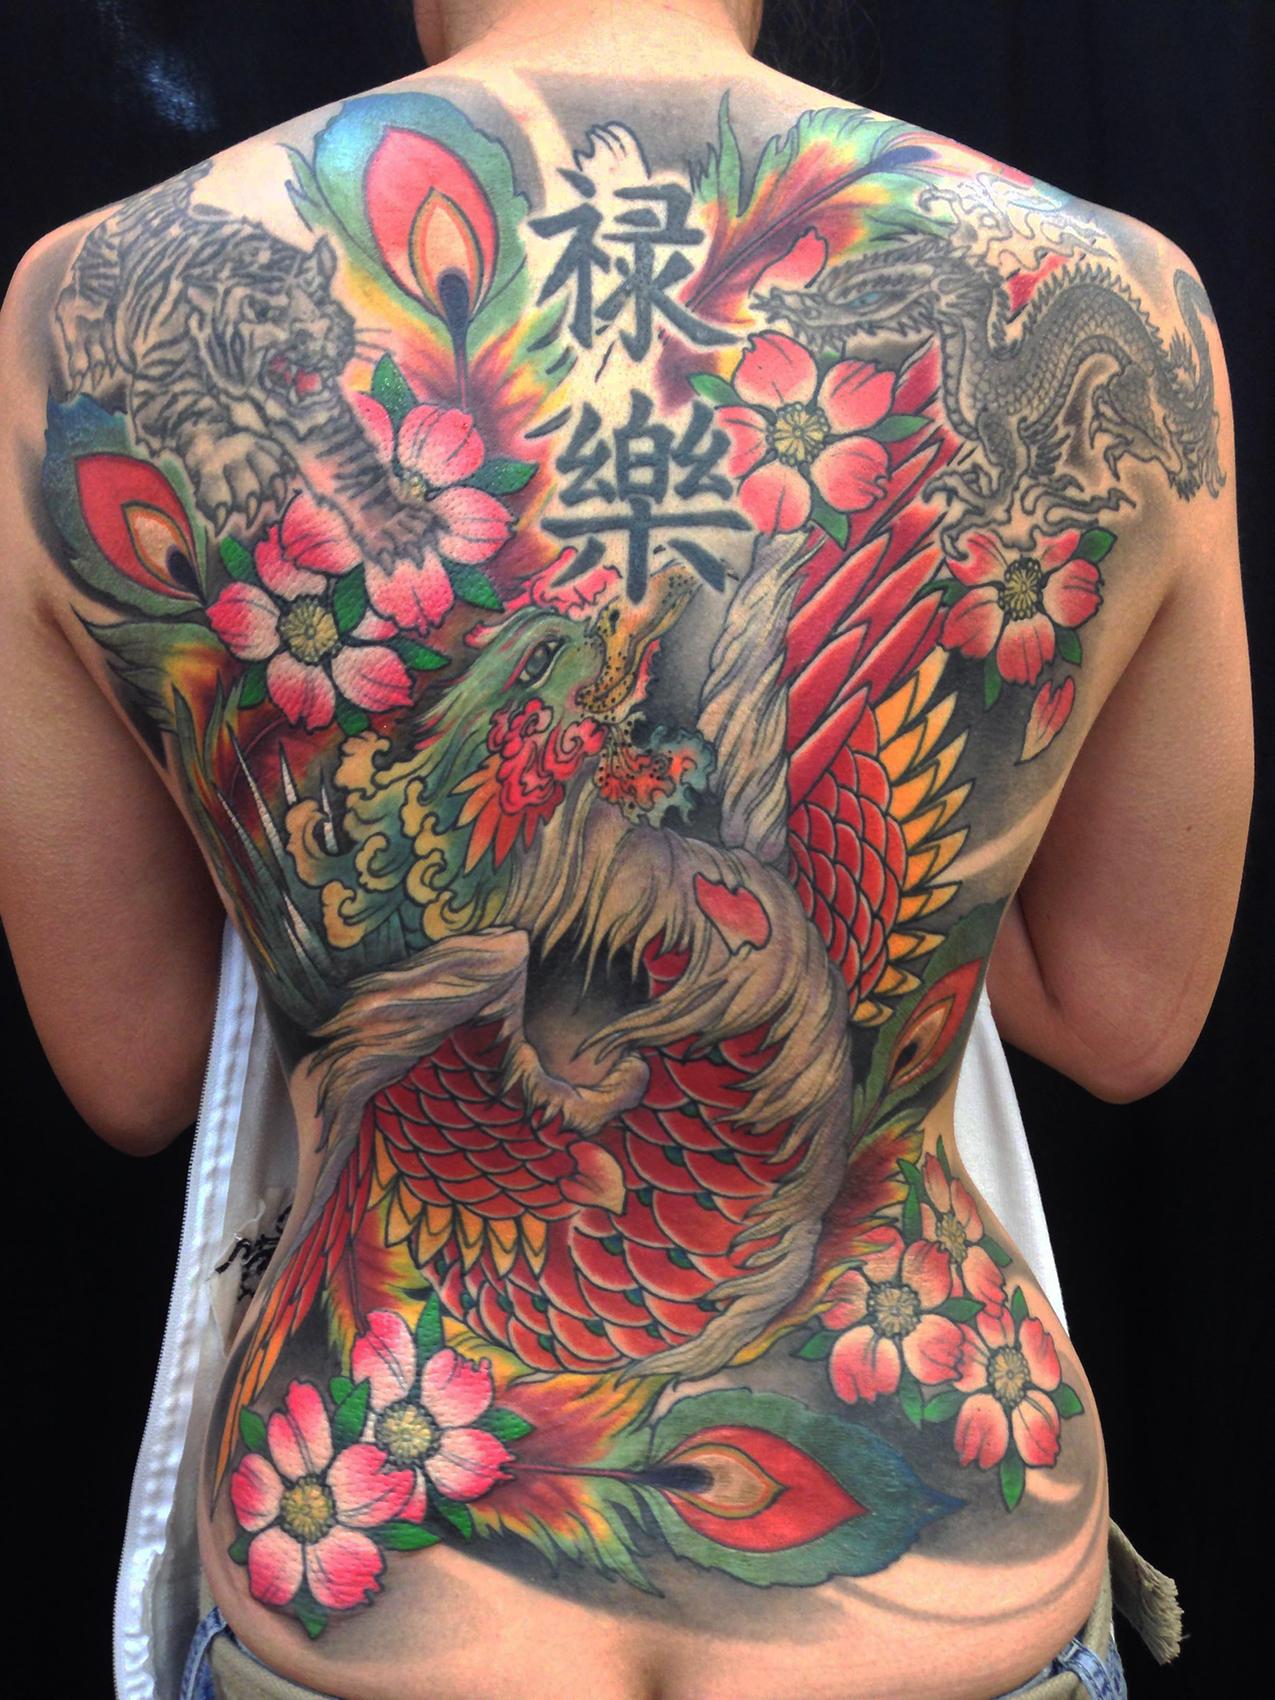 6fb4d1de7 Japanese Tattoos Archives - Funhouse Tattoo San Diego